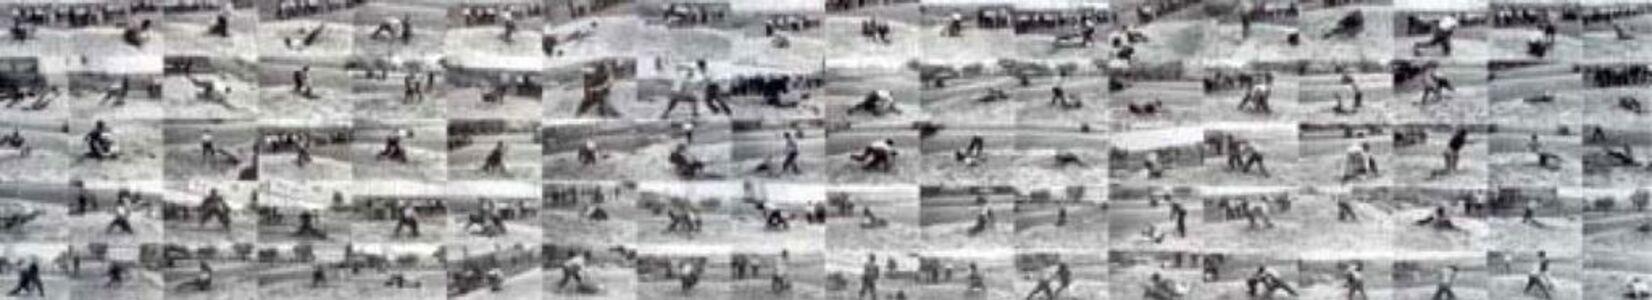 He Yunchang 何云昌, 'Wrestling', 2001